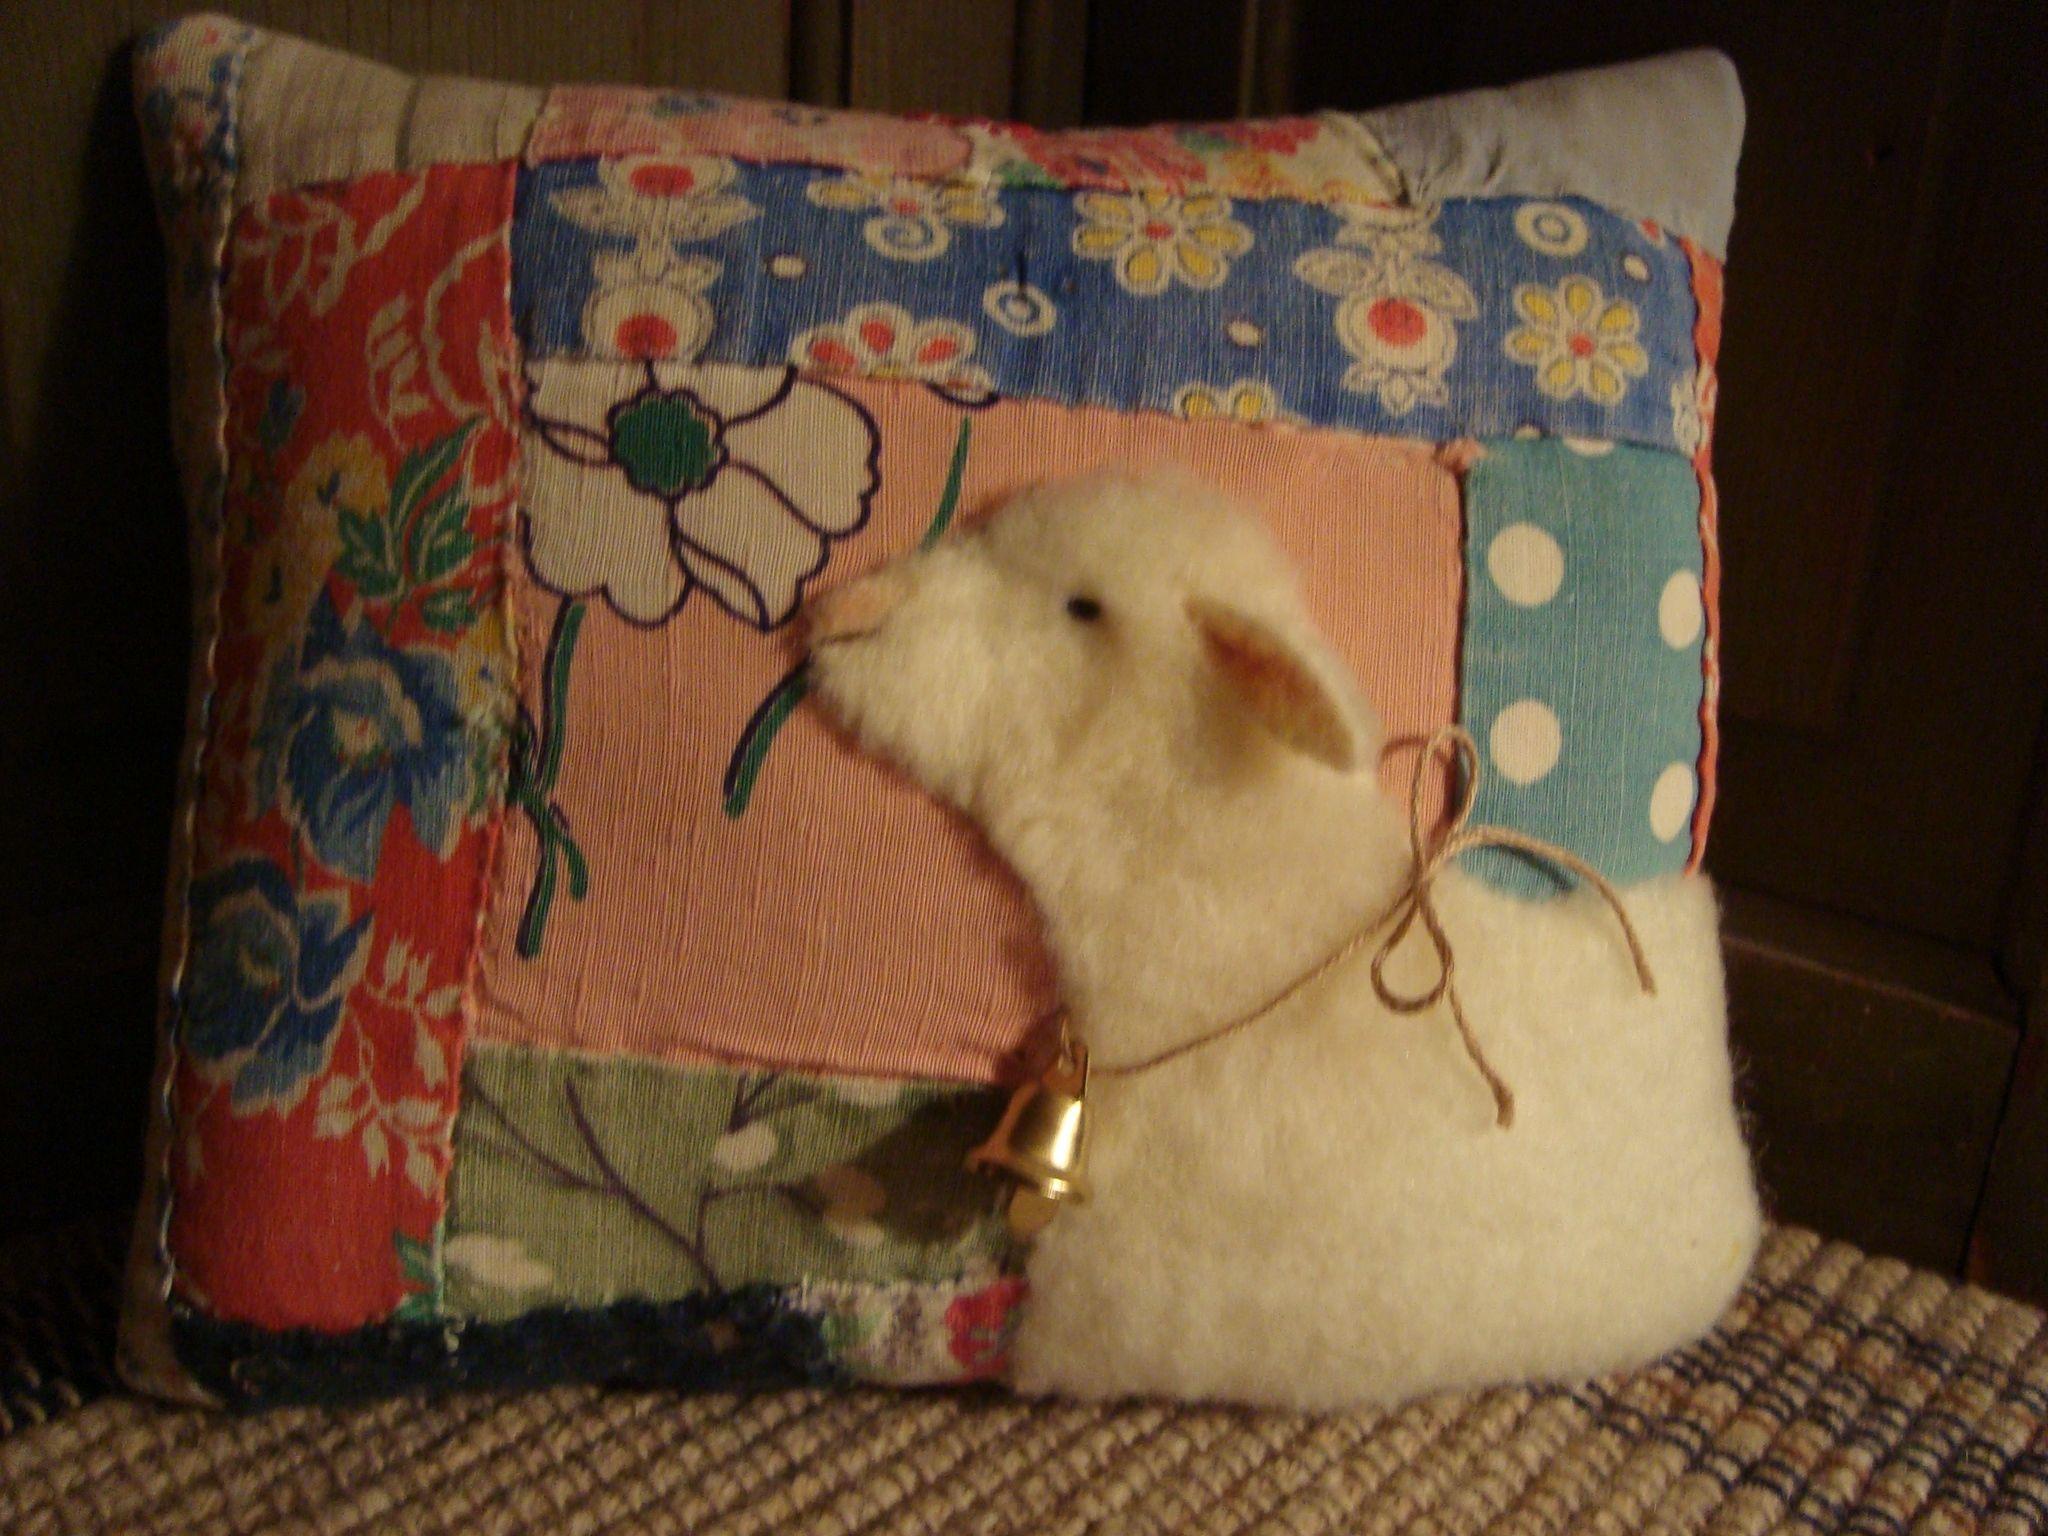 Animal Pillow Pinterest : Sheep On Feedsack Quilt Pillow Antique Quilt Animal Pillows Pinterest Quilted pillow and Sheep